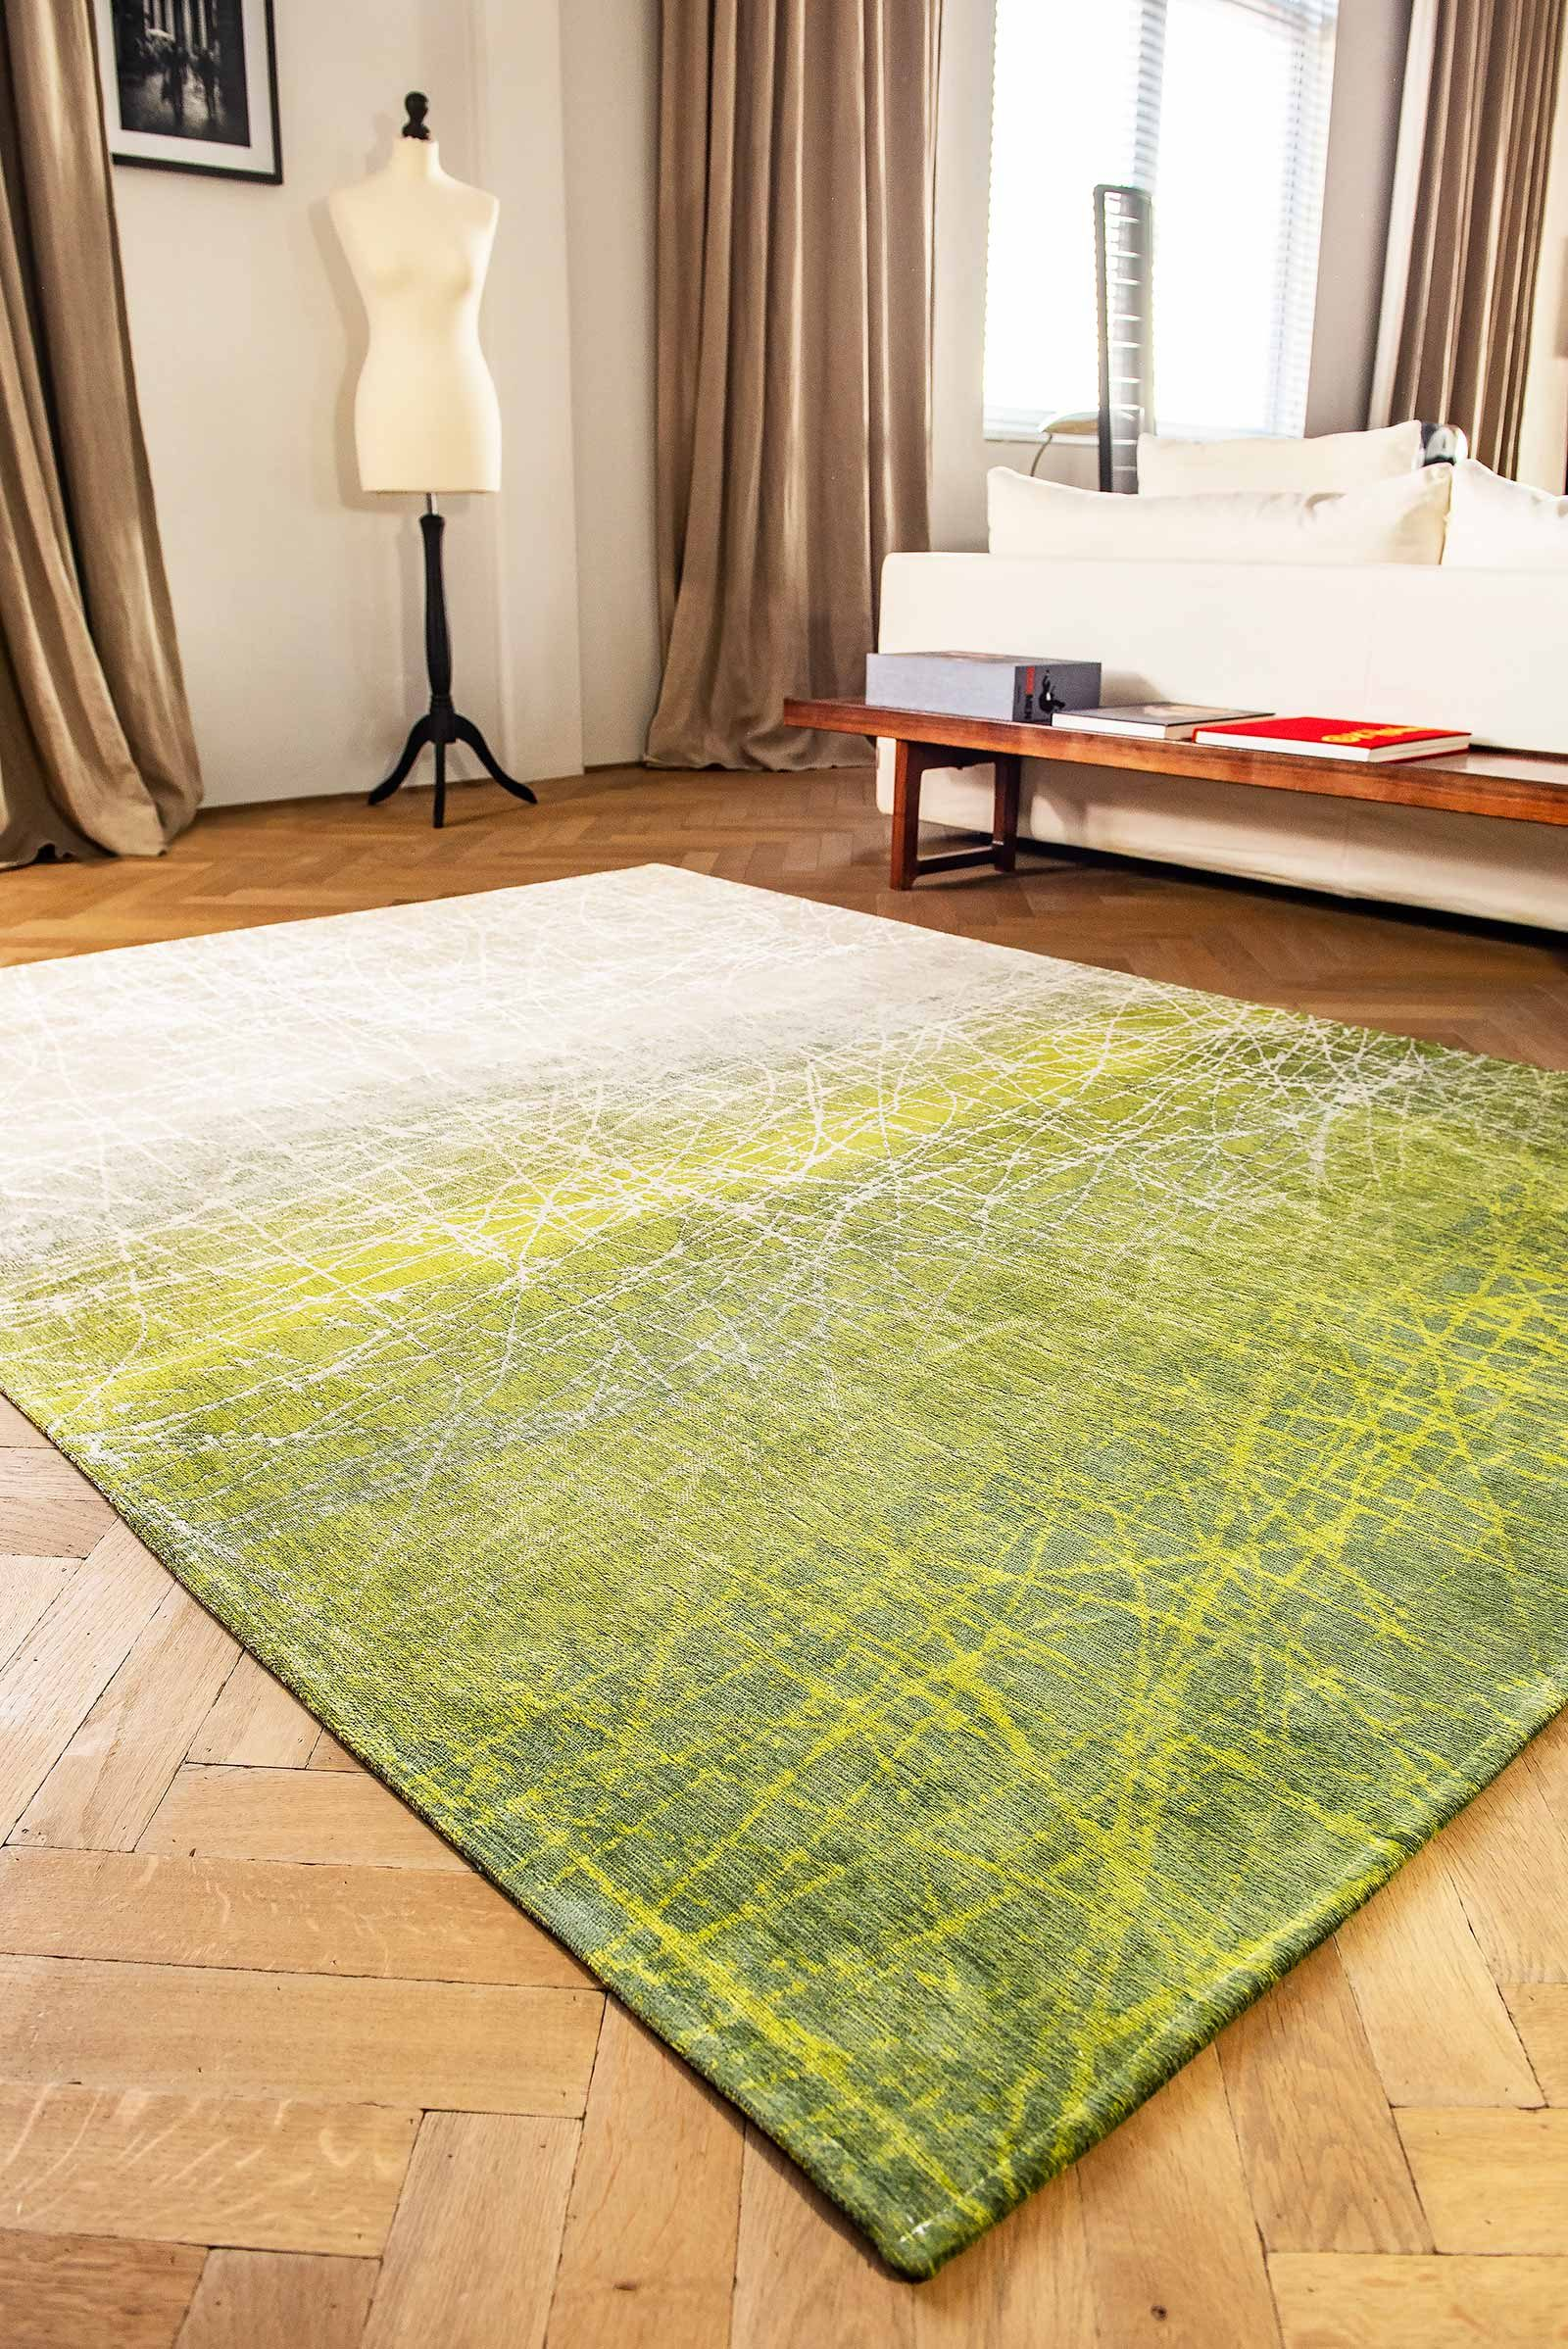 alfombras Louis De Poortere LX 8882 Mad Men Fahrenheit Central Park Green interior